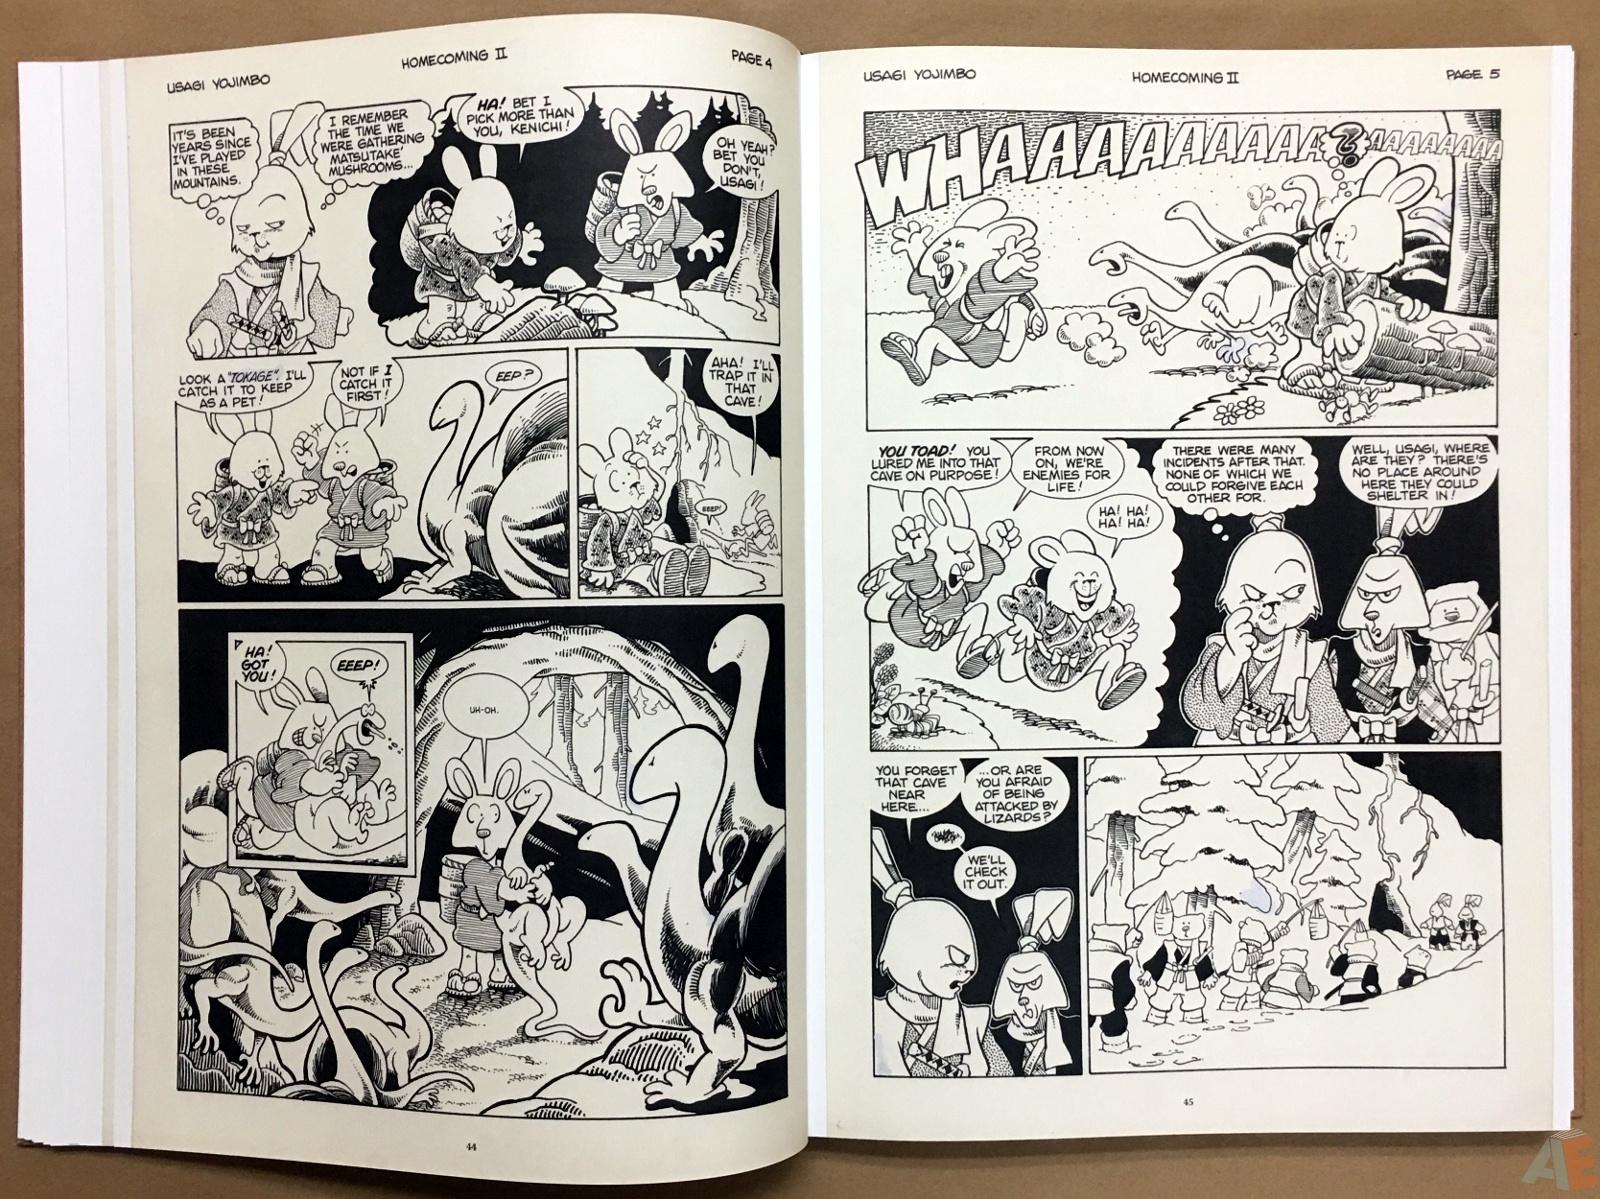 Usagi Yojimbo: Samurai and Other Stories Gallery Edition 16